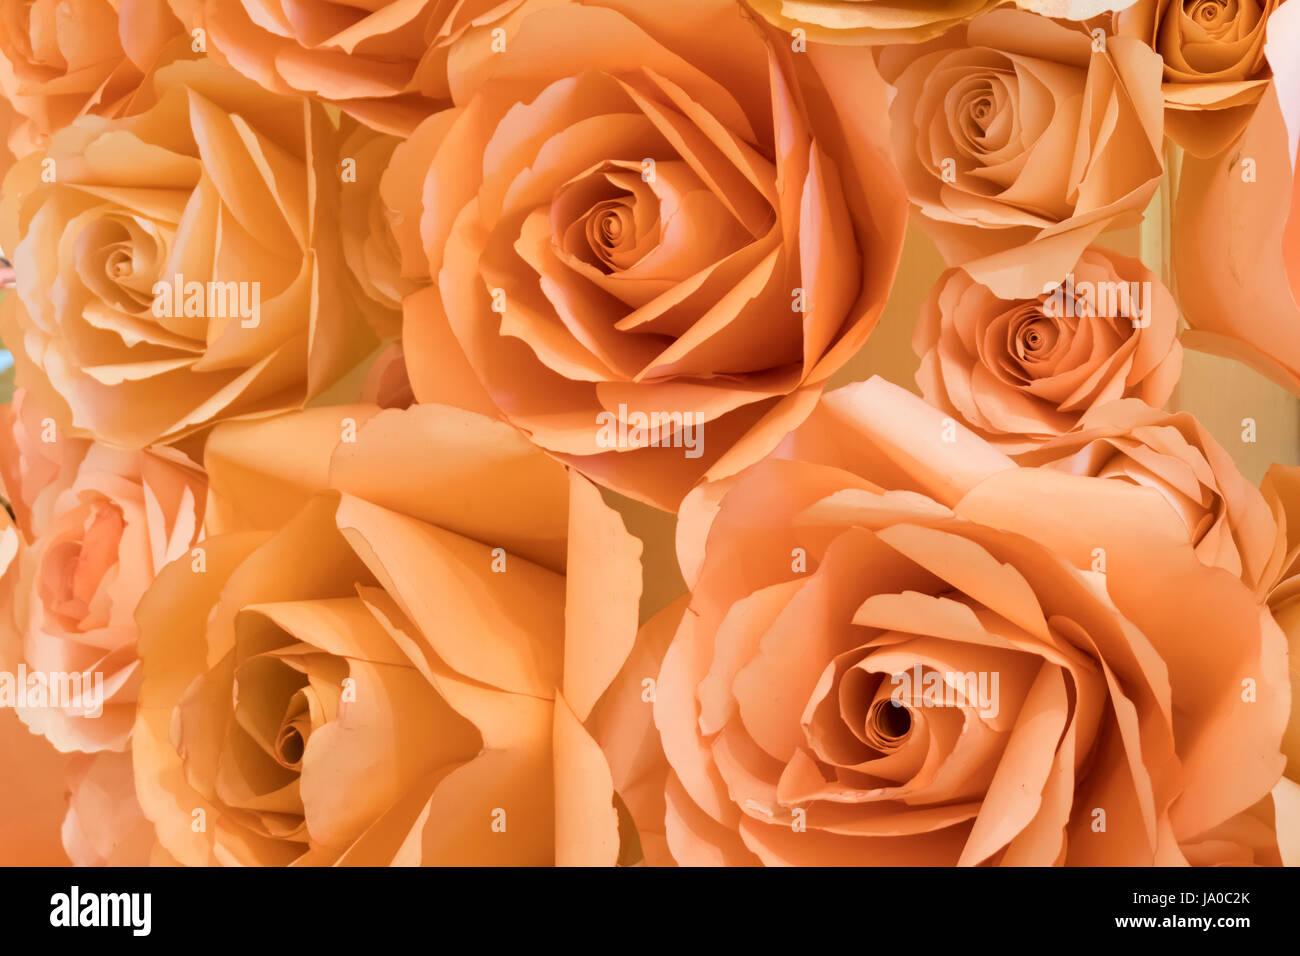 Arancione Rosa Color Pesca Carta Artigianale Sfondo Rosa Foto